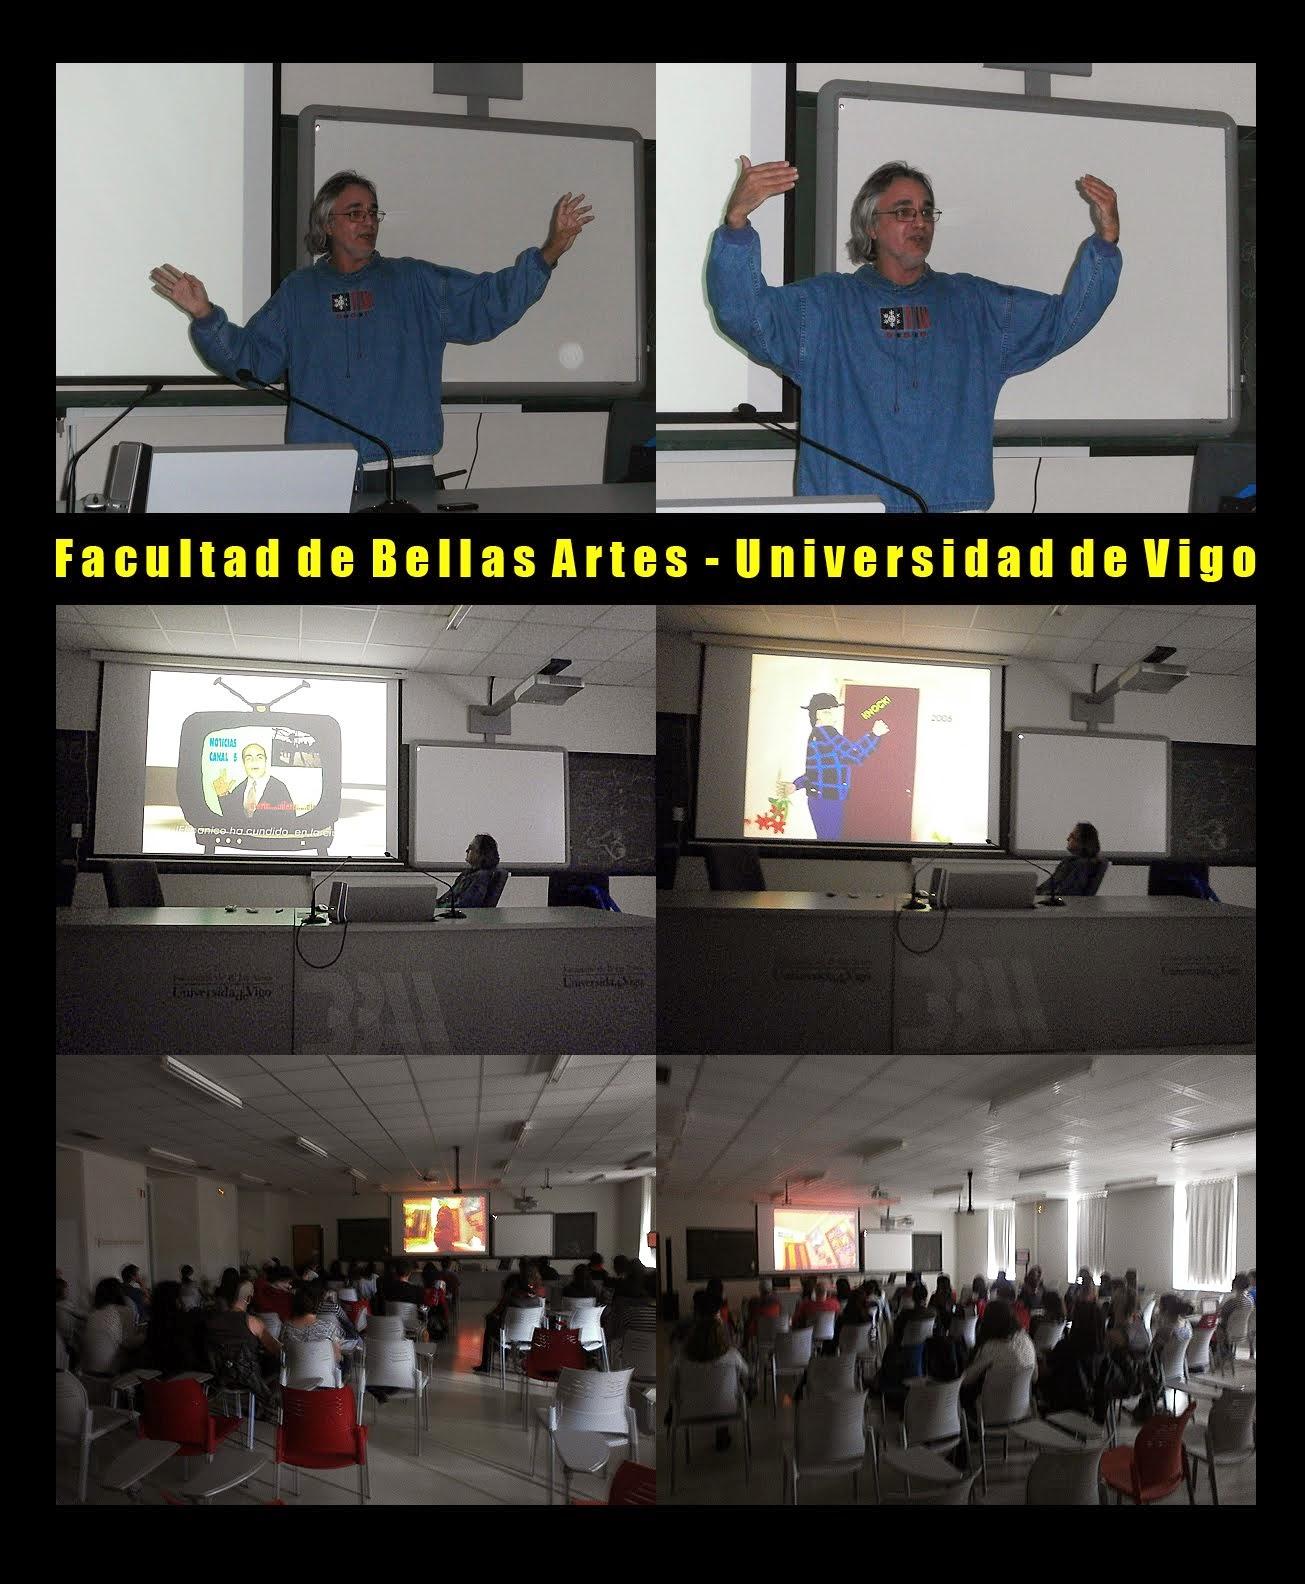 EN LA UNIVERSIDAD DE VIGO...